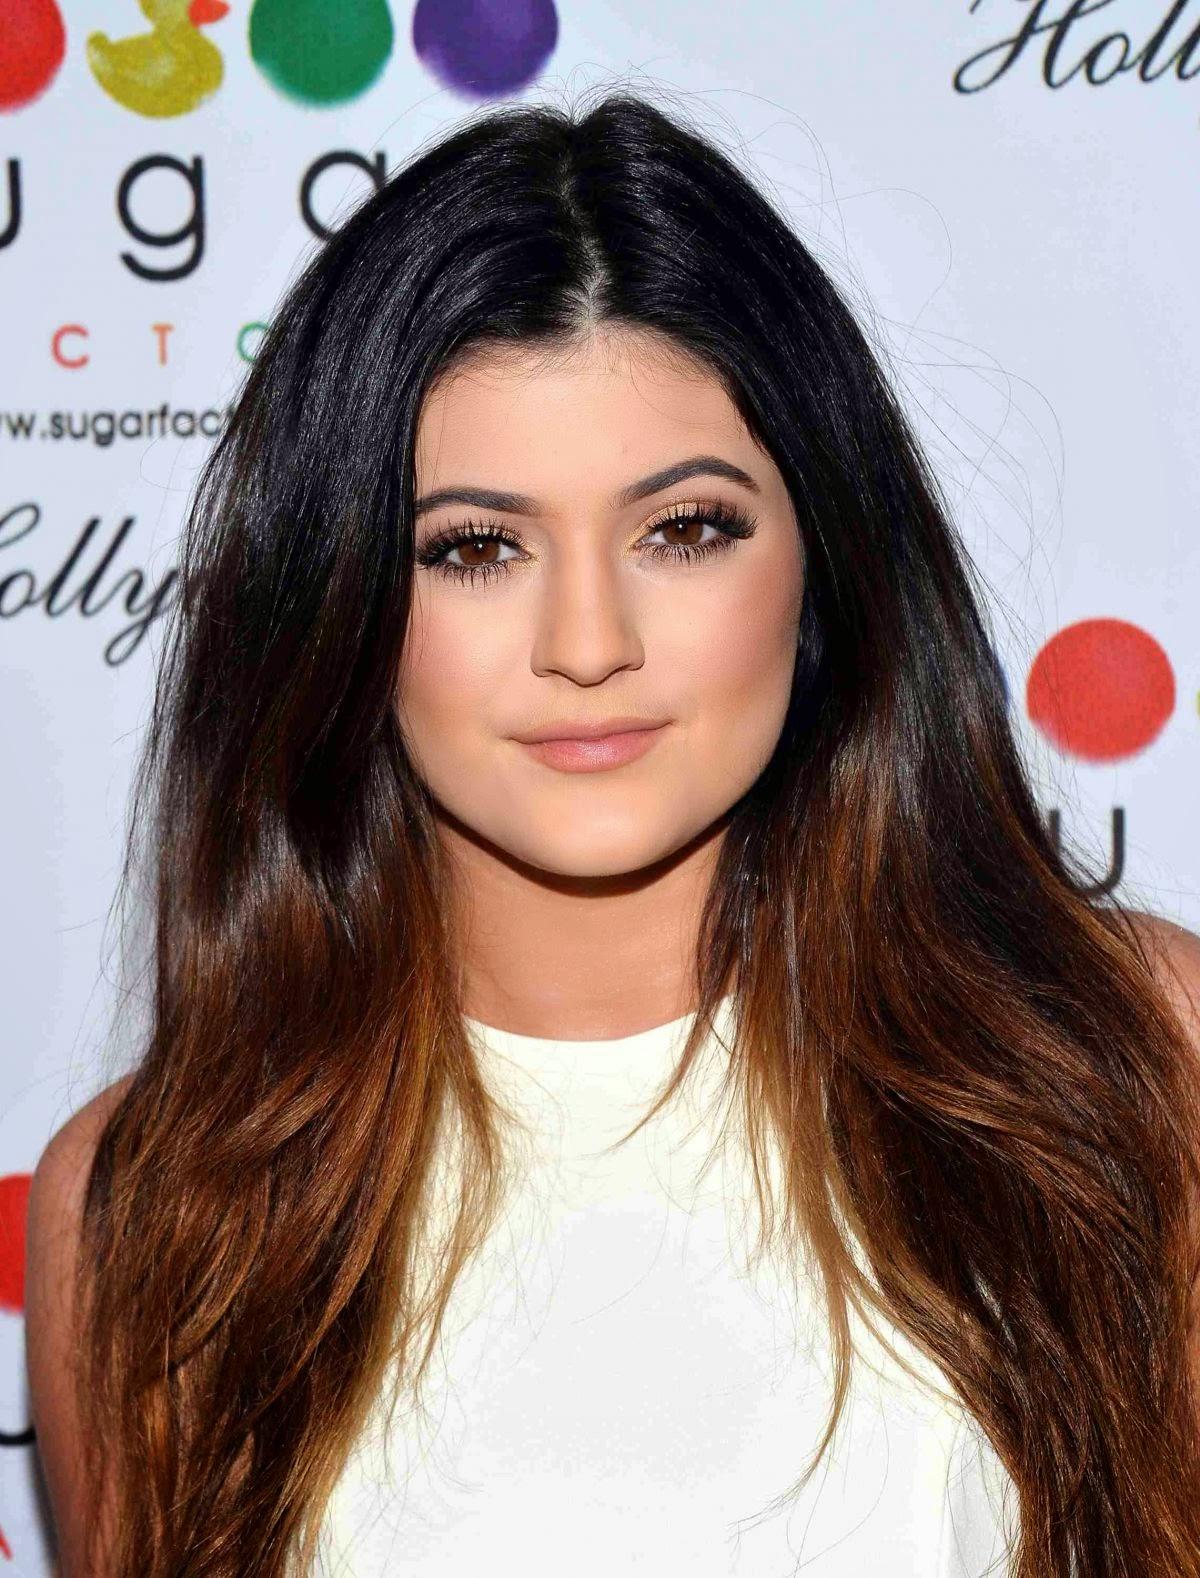 Project Scandalous: Kylie Jenner: Just LIke The Kardashian